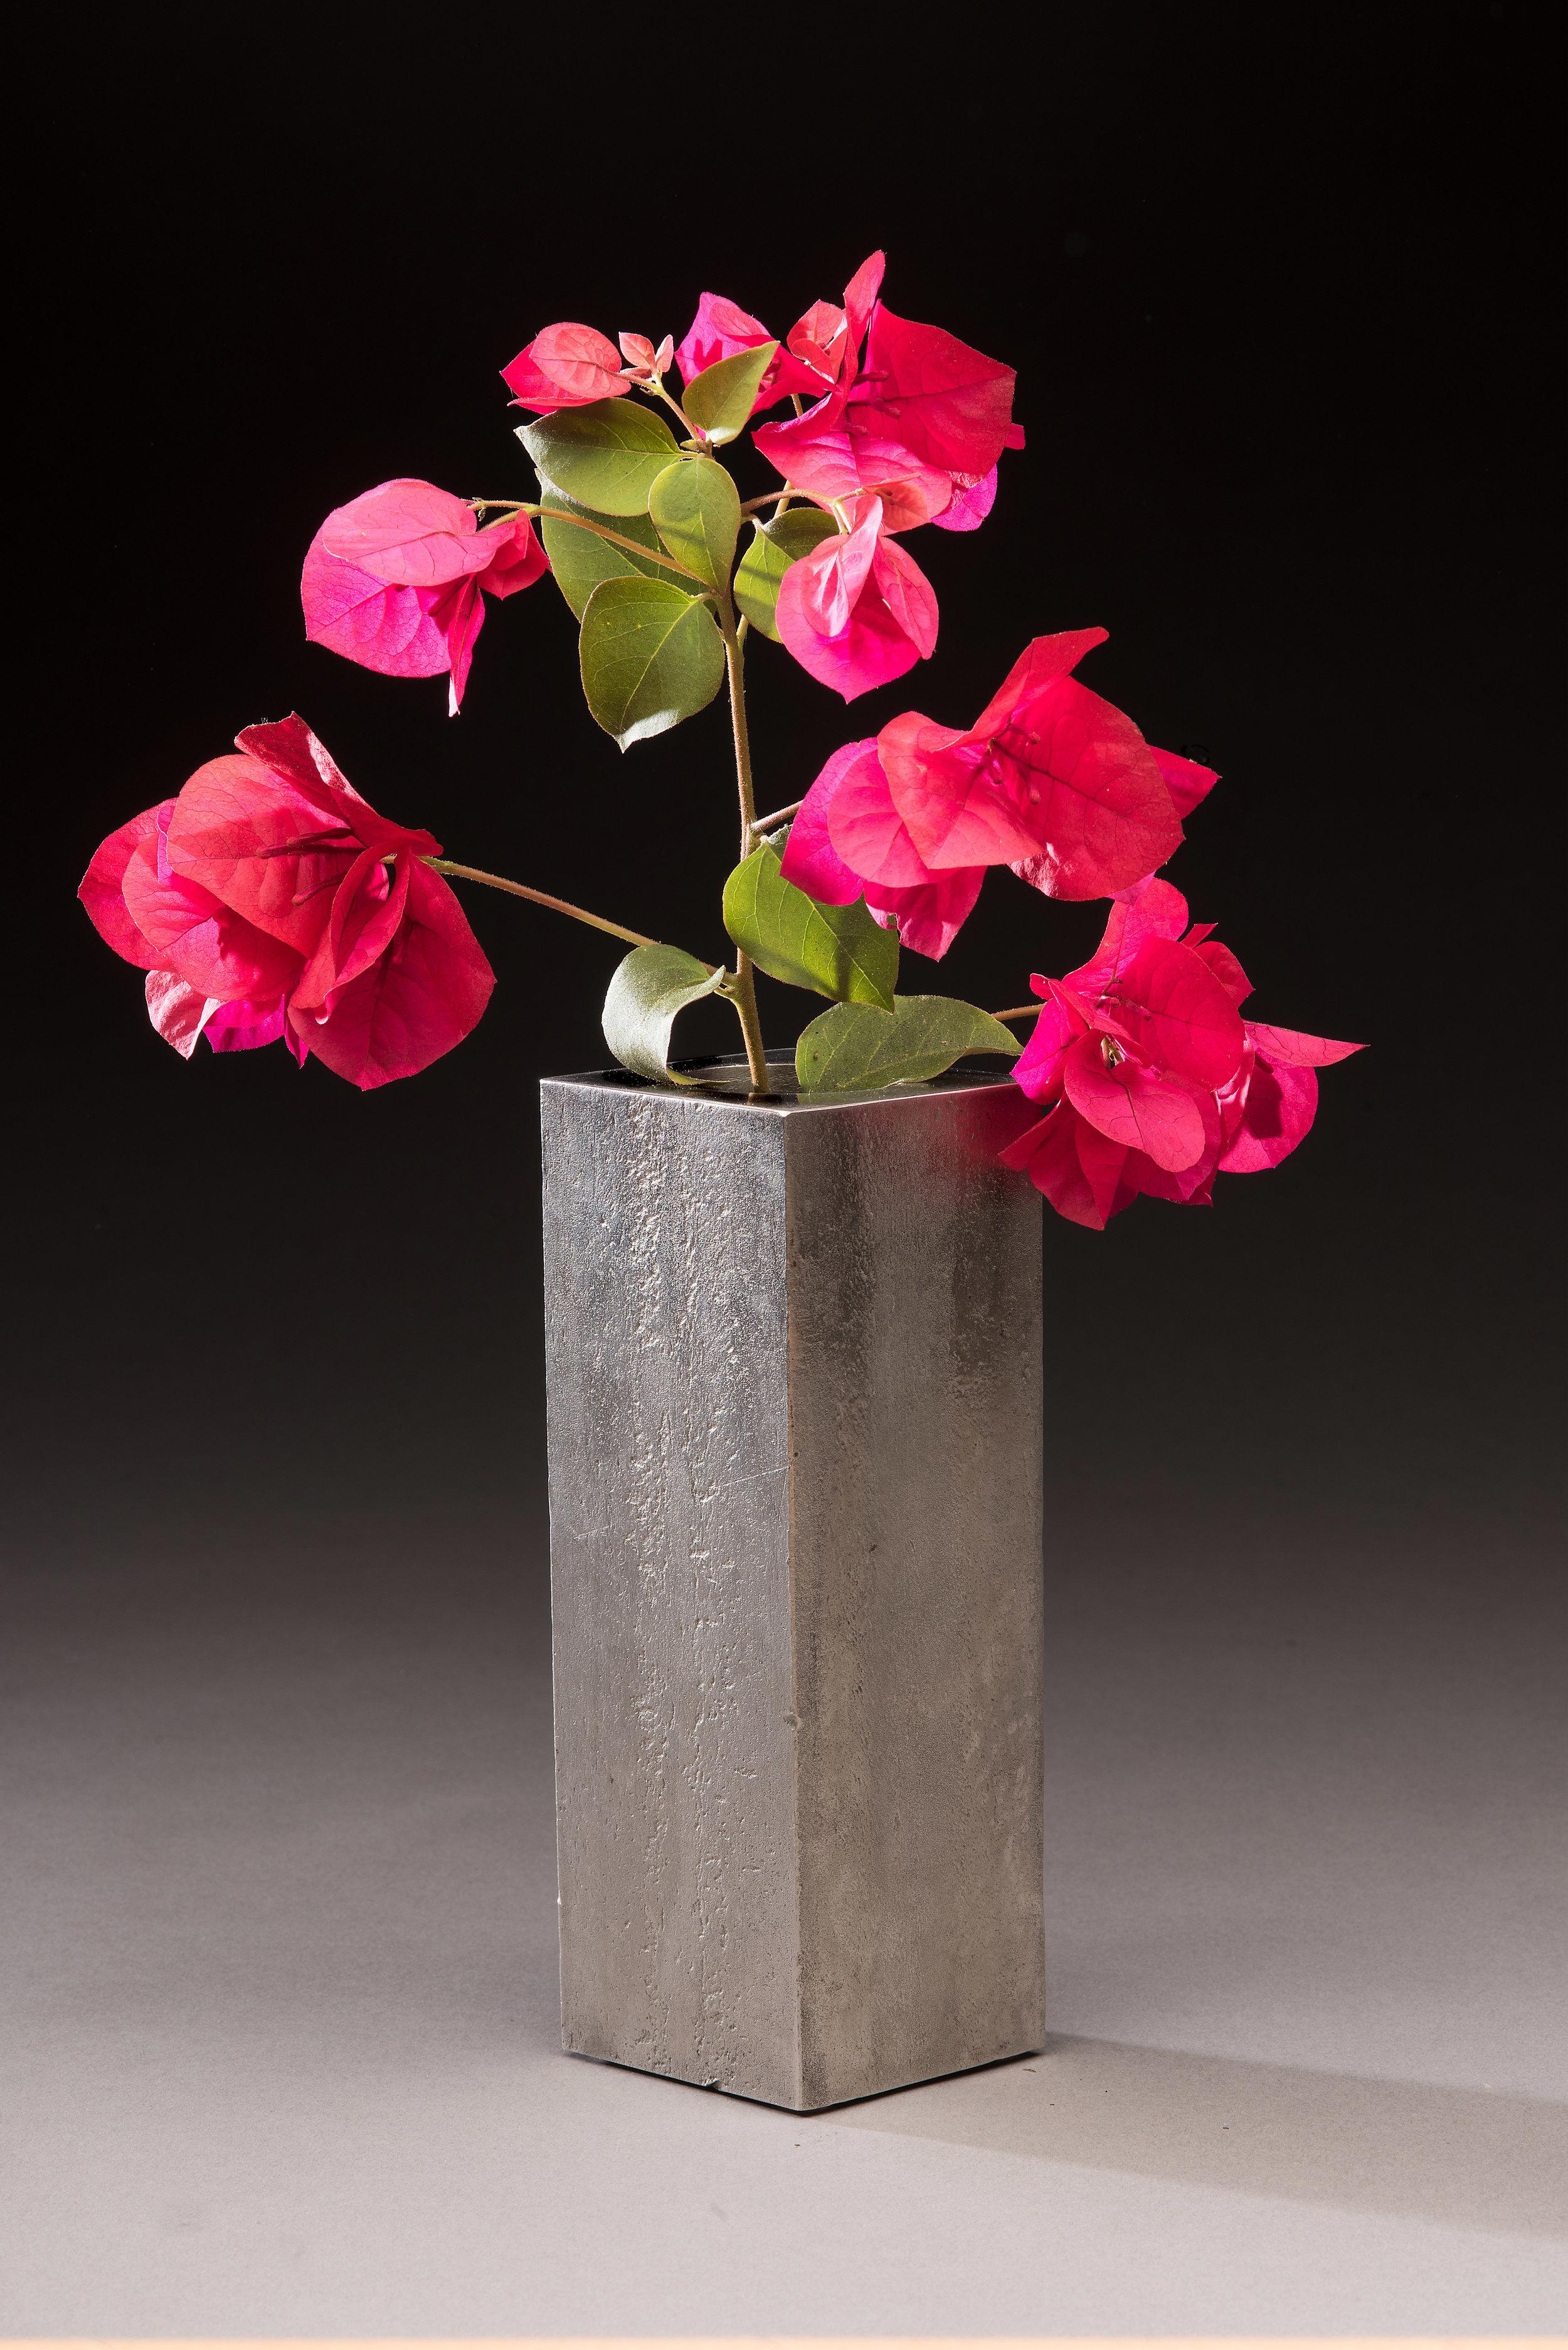 Stainless Steel Vase